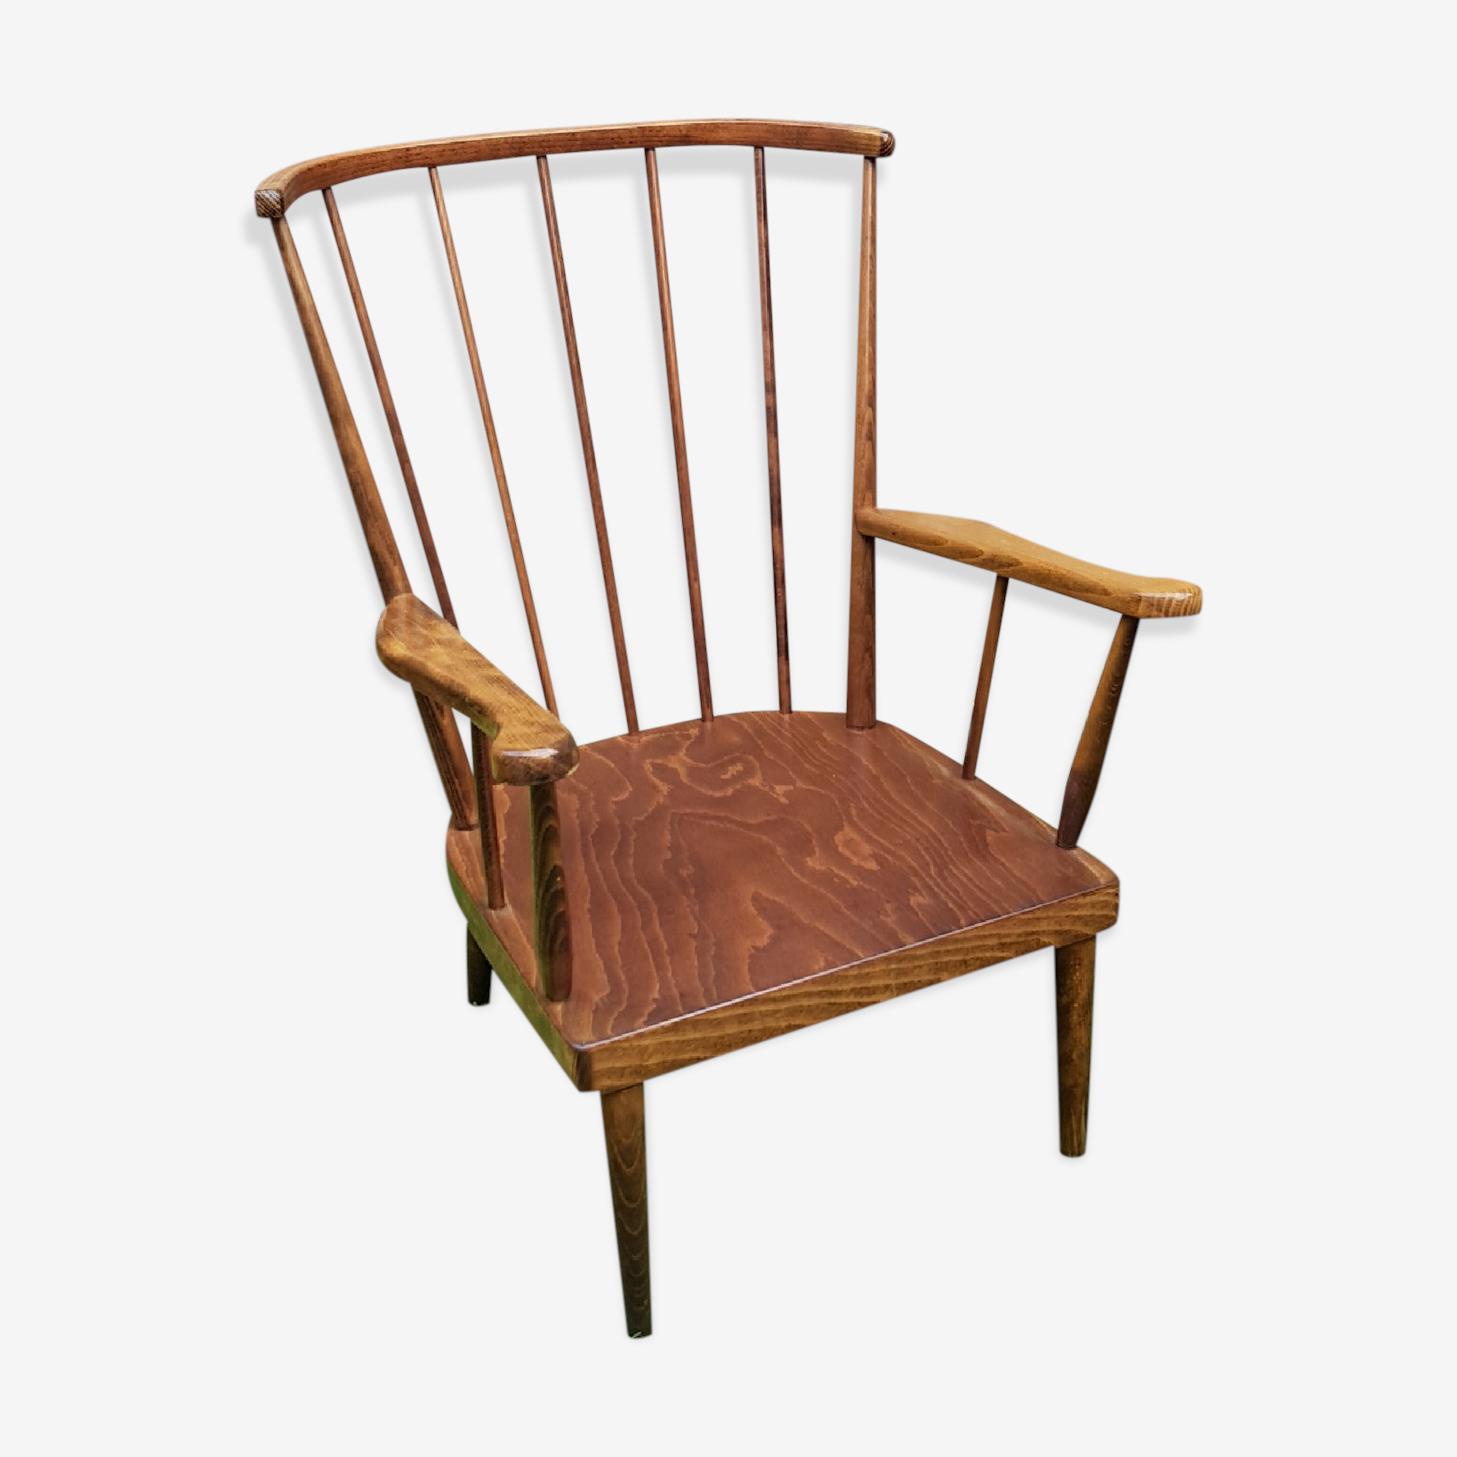 Baumann armchair model range